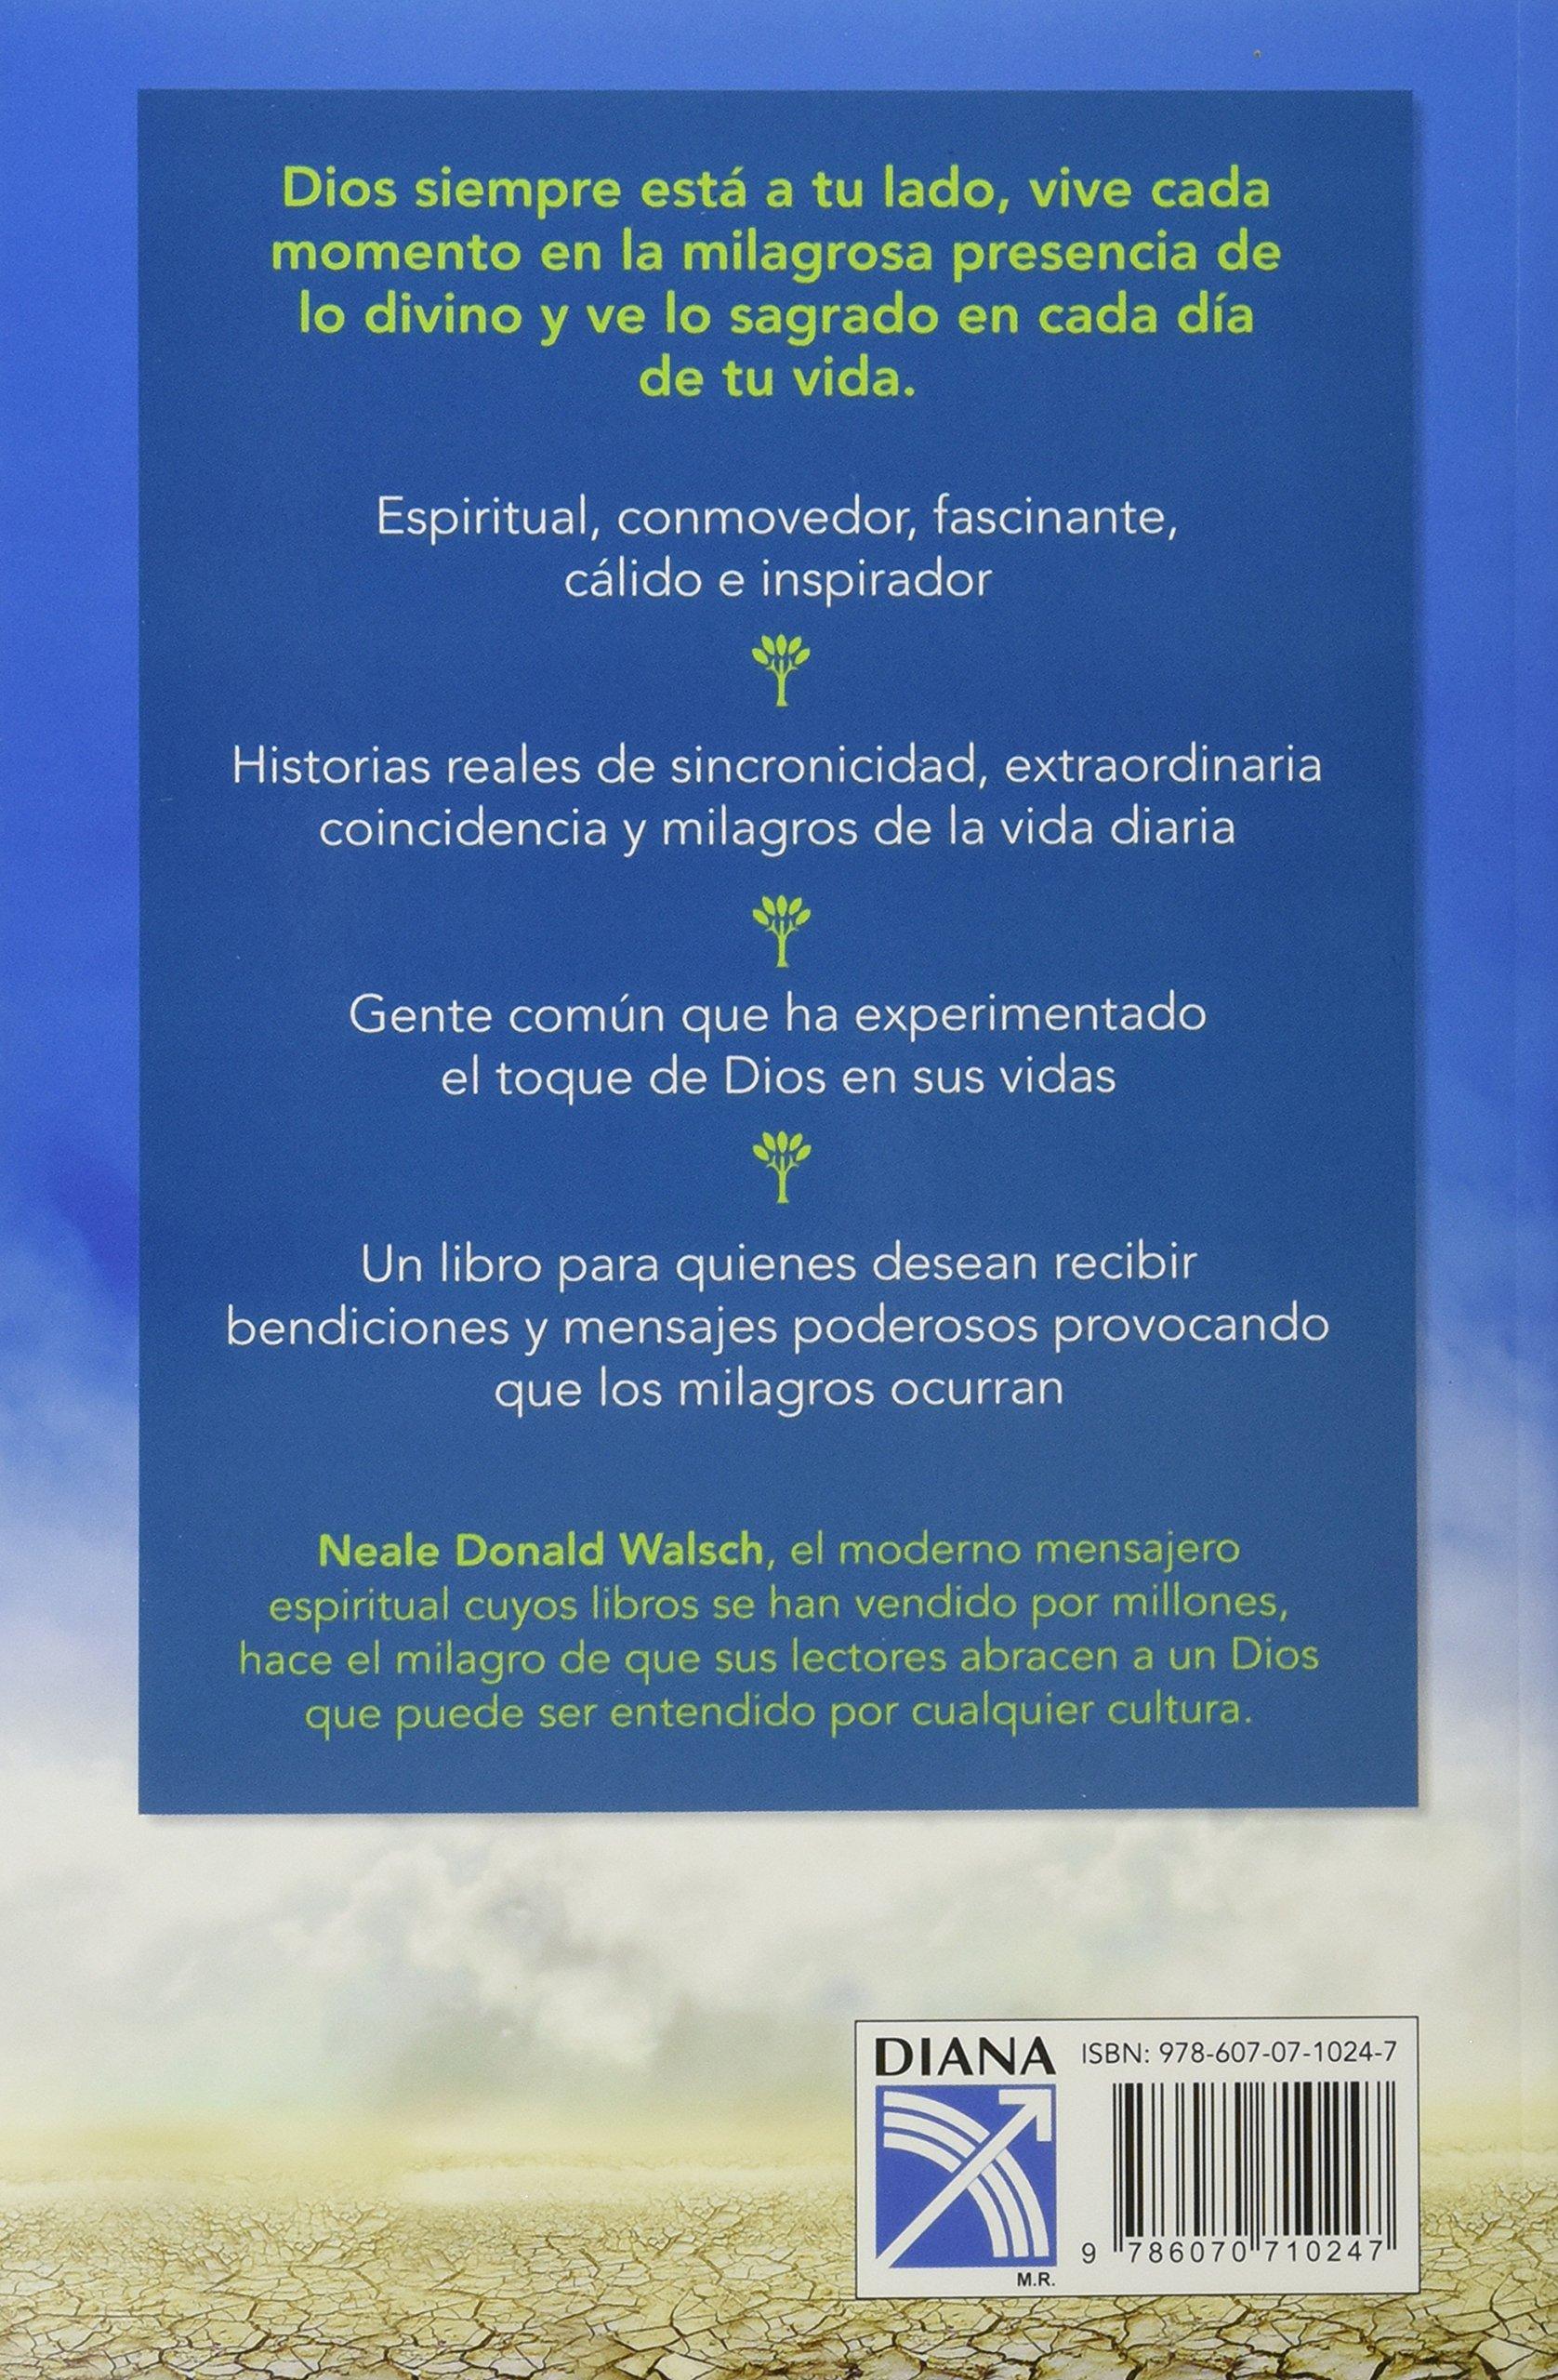 Cuando Dios Llega, Los Milagros Ocurren (spanish Edition): Neale Donald  Walsch: 9786070710247: Amazon: Books